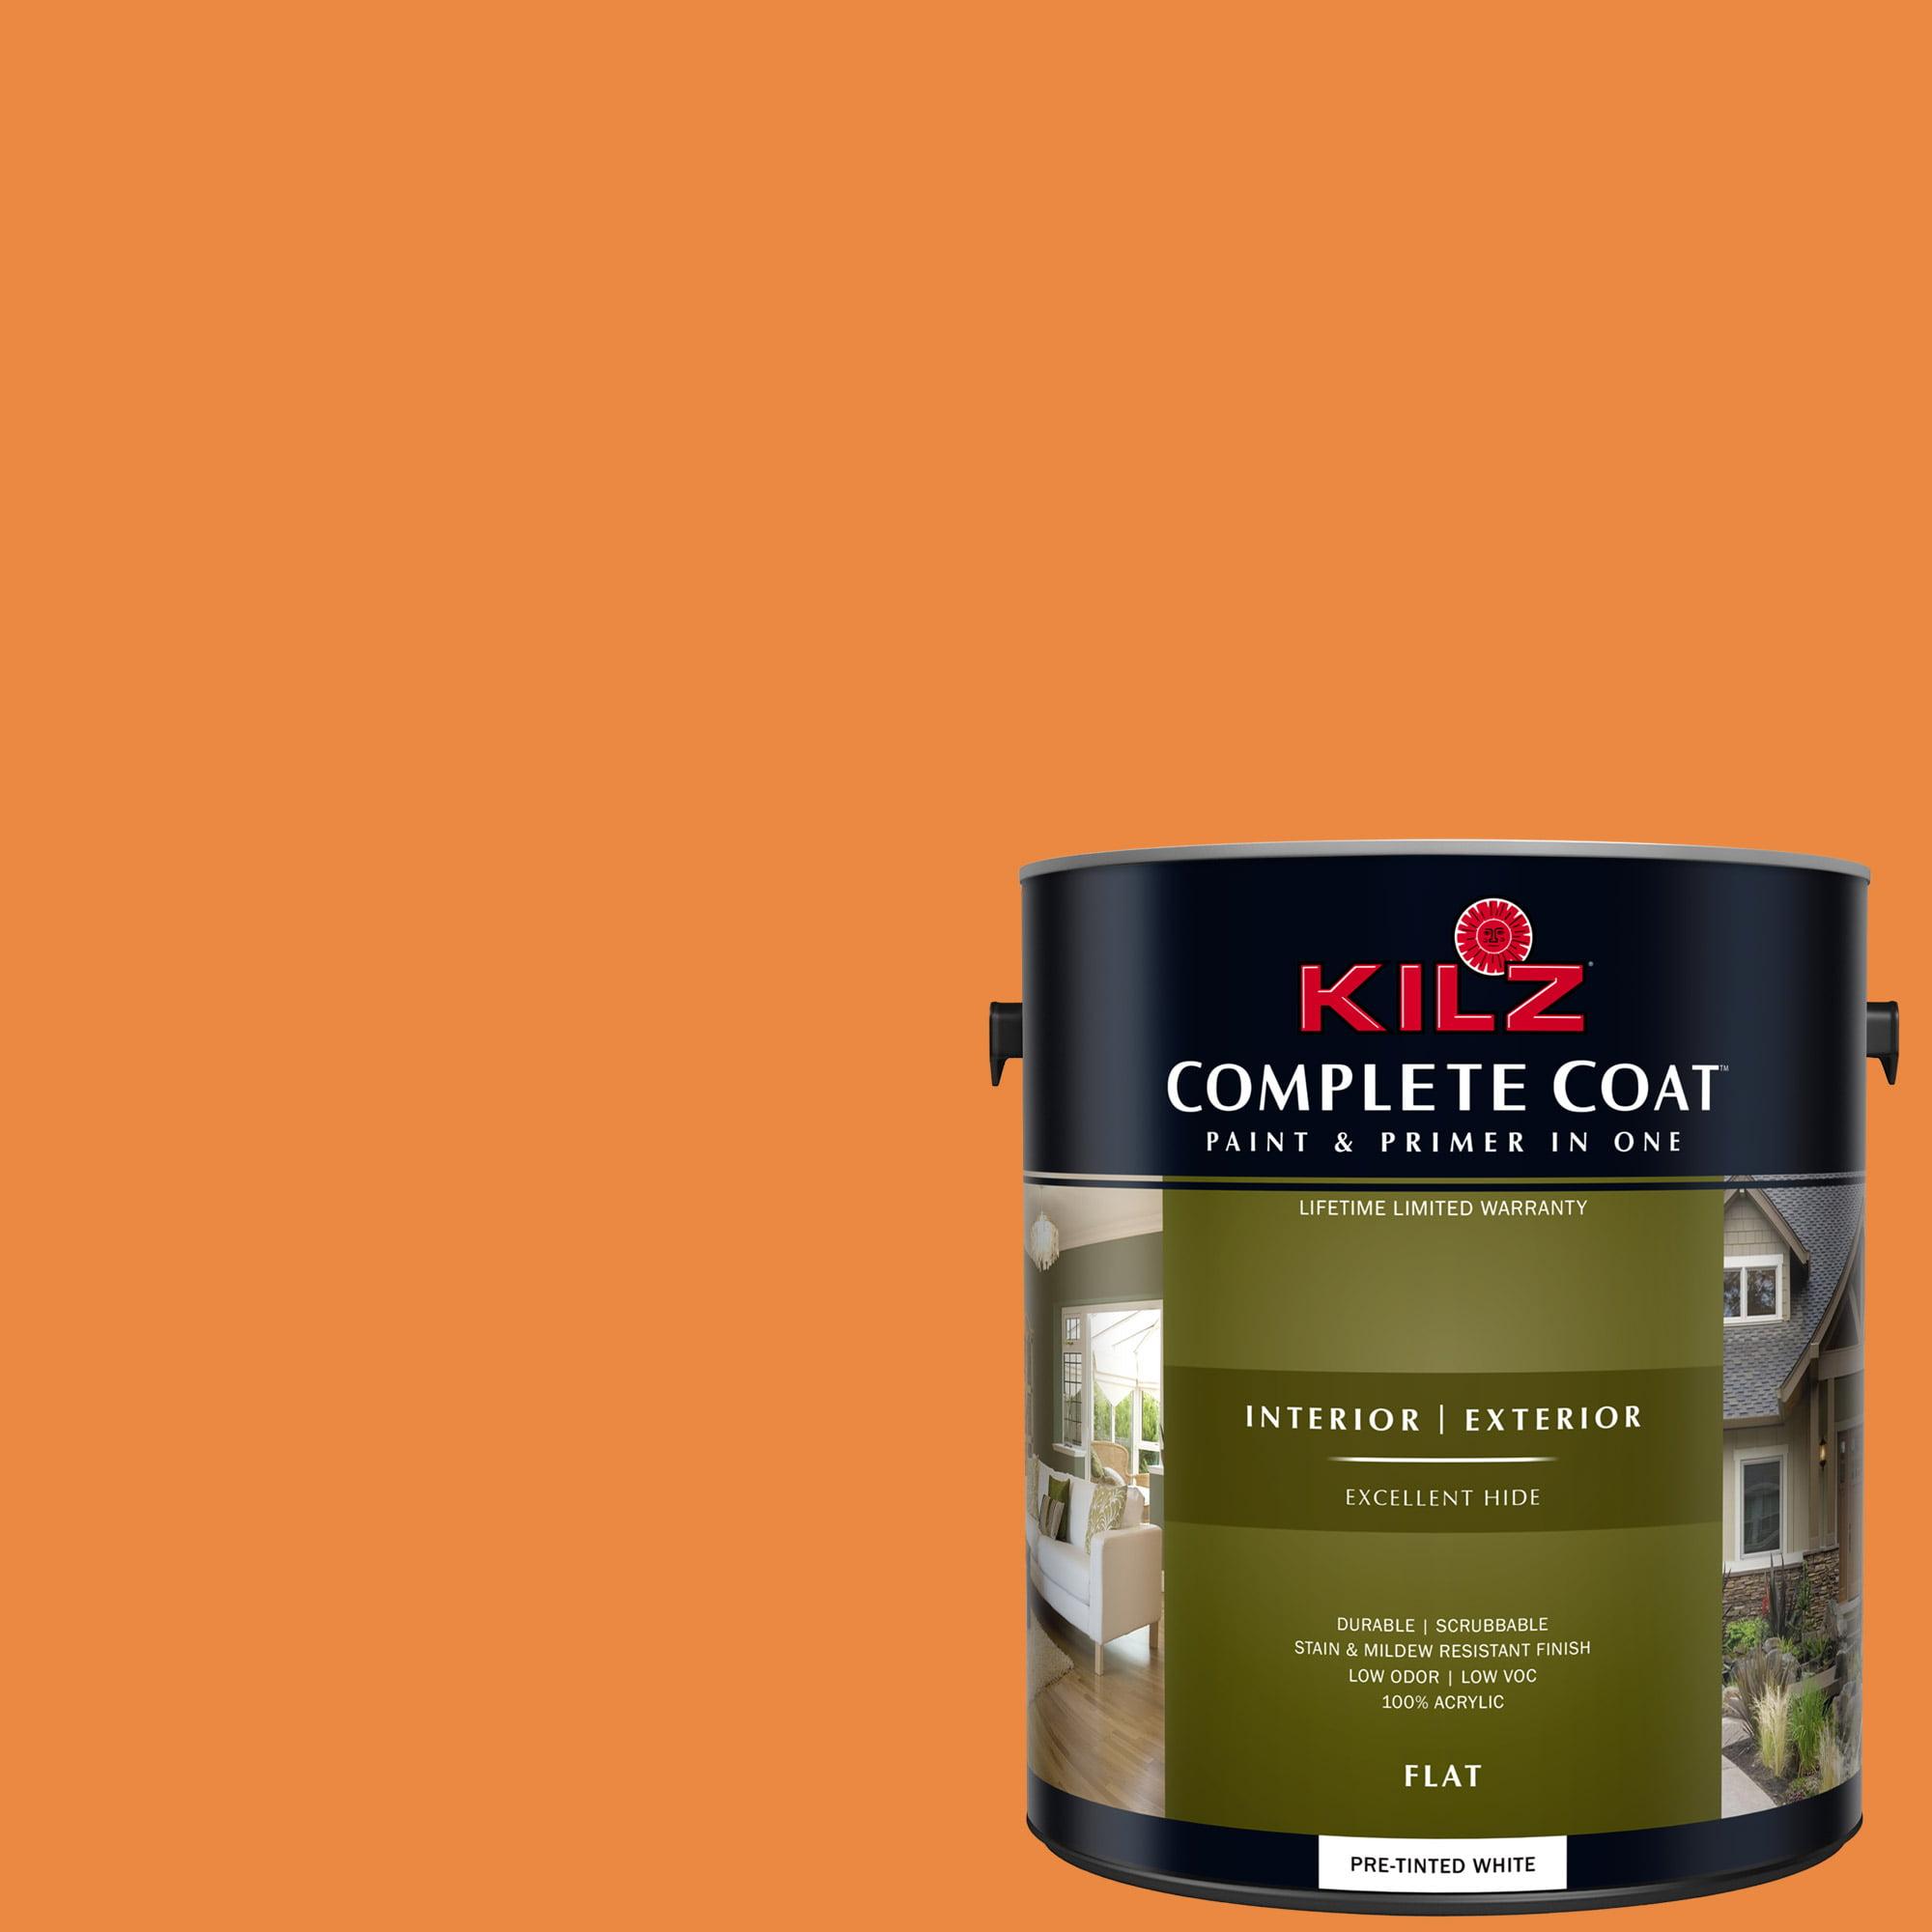 KILZ COMPLETE COAT Interior/Exterior Paint & Primer in One #LH210 Liger